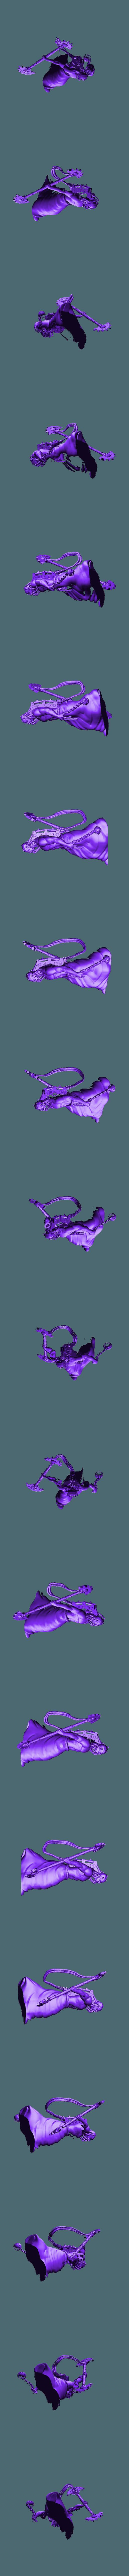 Fulgurite_6.2.stl Download free STL file Martian Electric Clergy • 3D print design, ErikTheHeretek